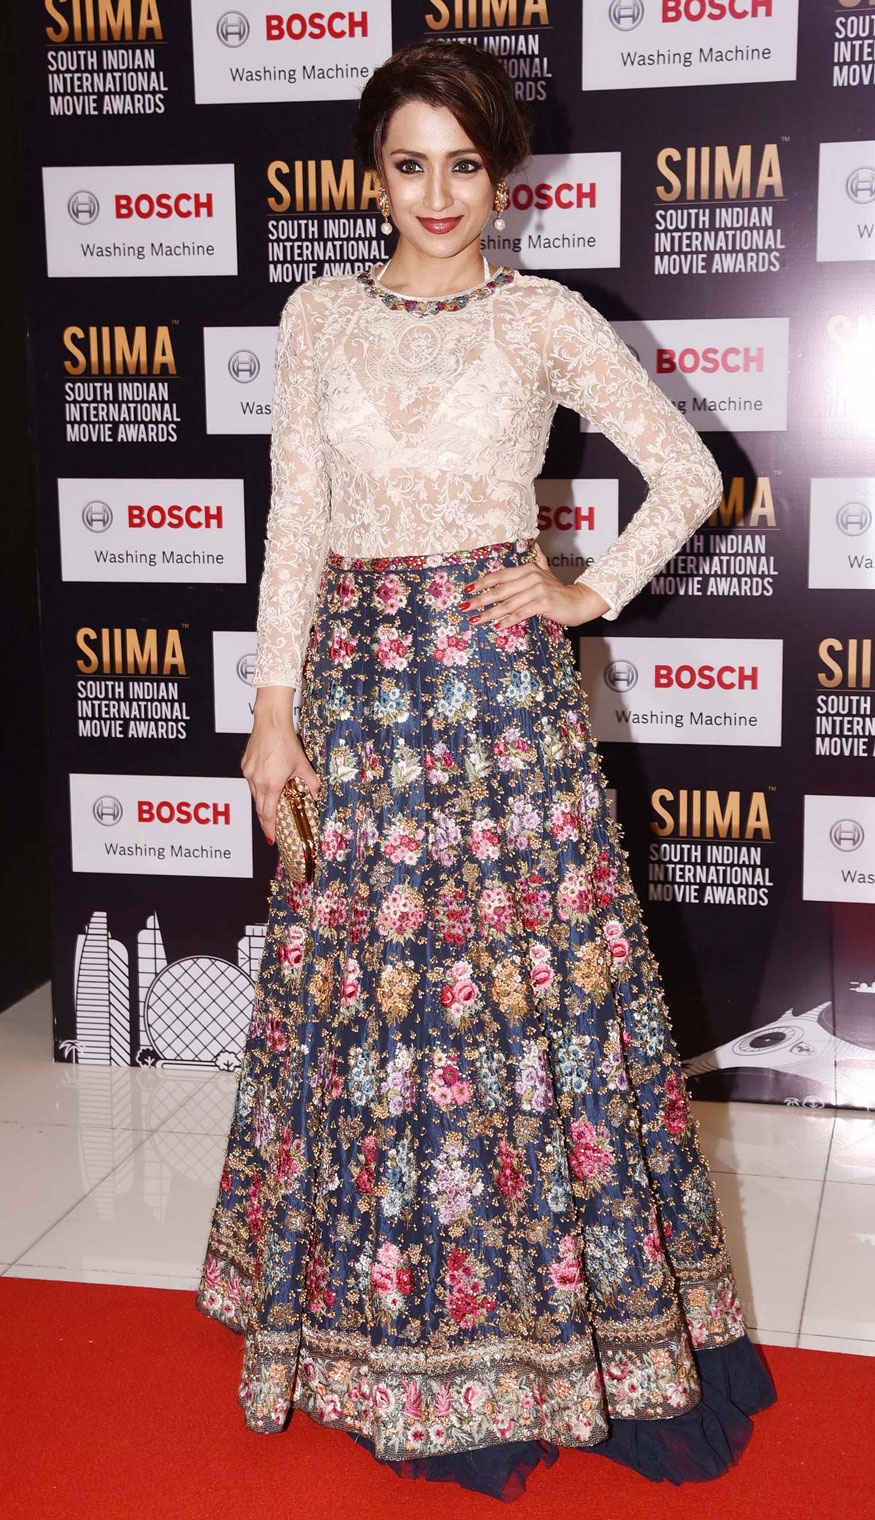 Trisha Krishnan Poses 6th SIIMA at Abu Dhabi National Exhibition Centre In Abu Dhabi